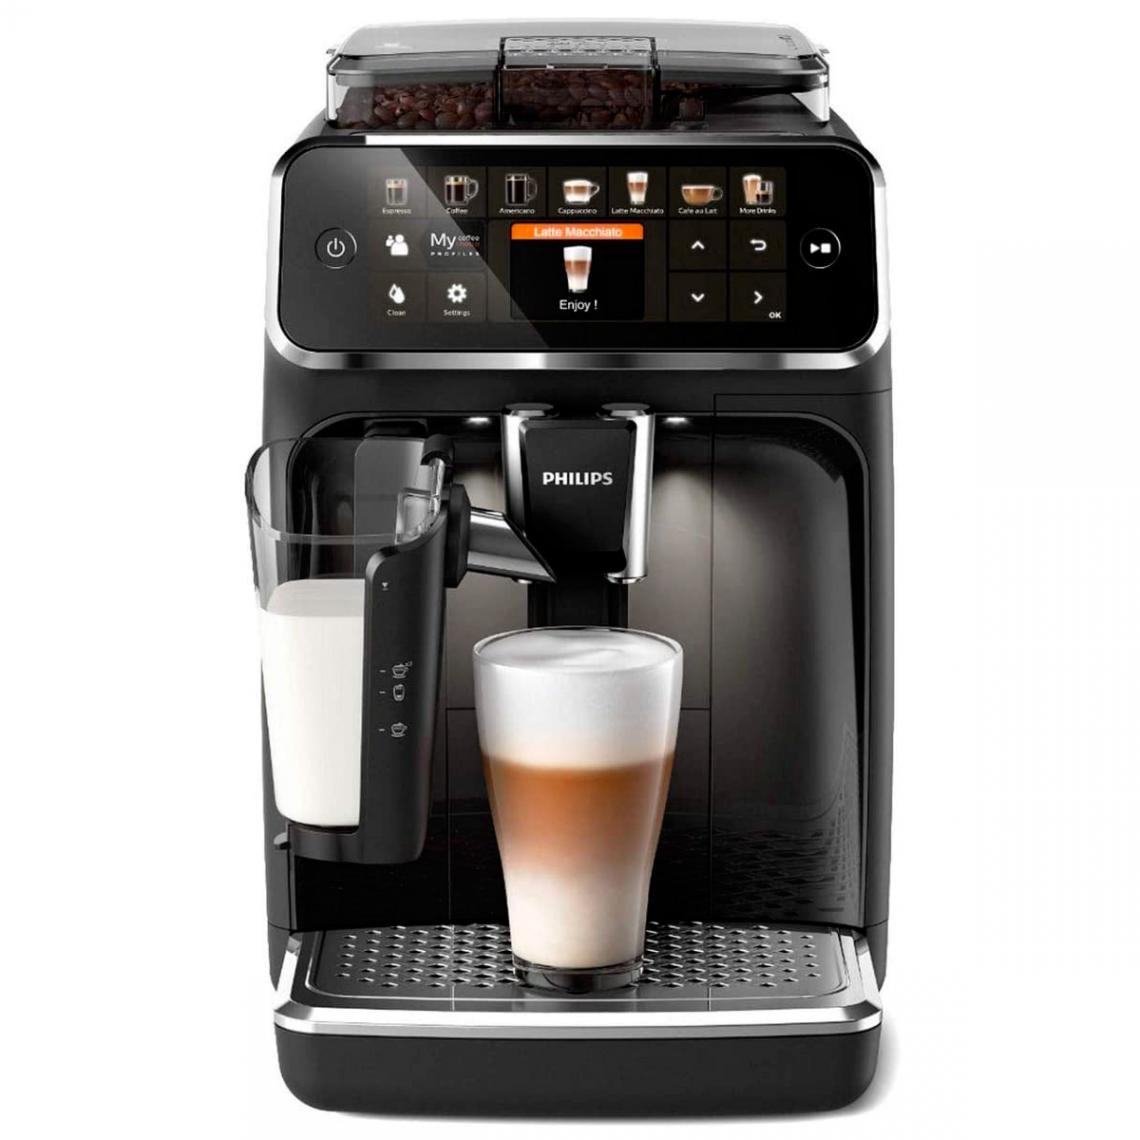 Philips Machine à café Expresso broyeur Série 5300 - EP5447/90 LatteGo